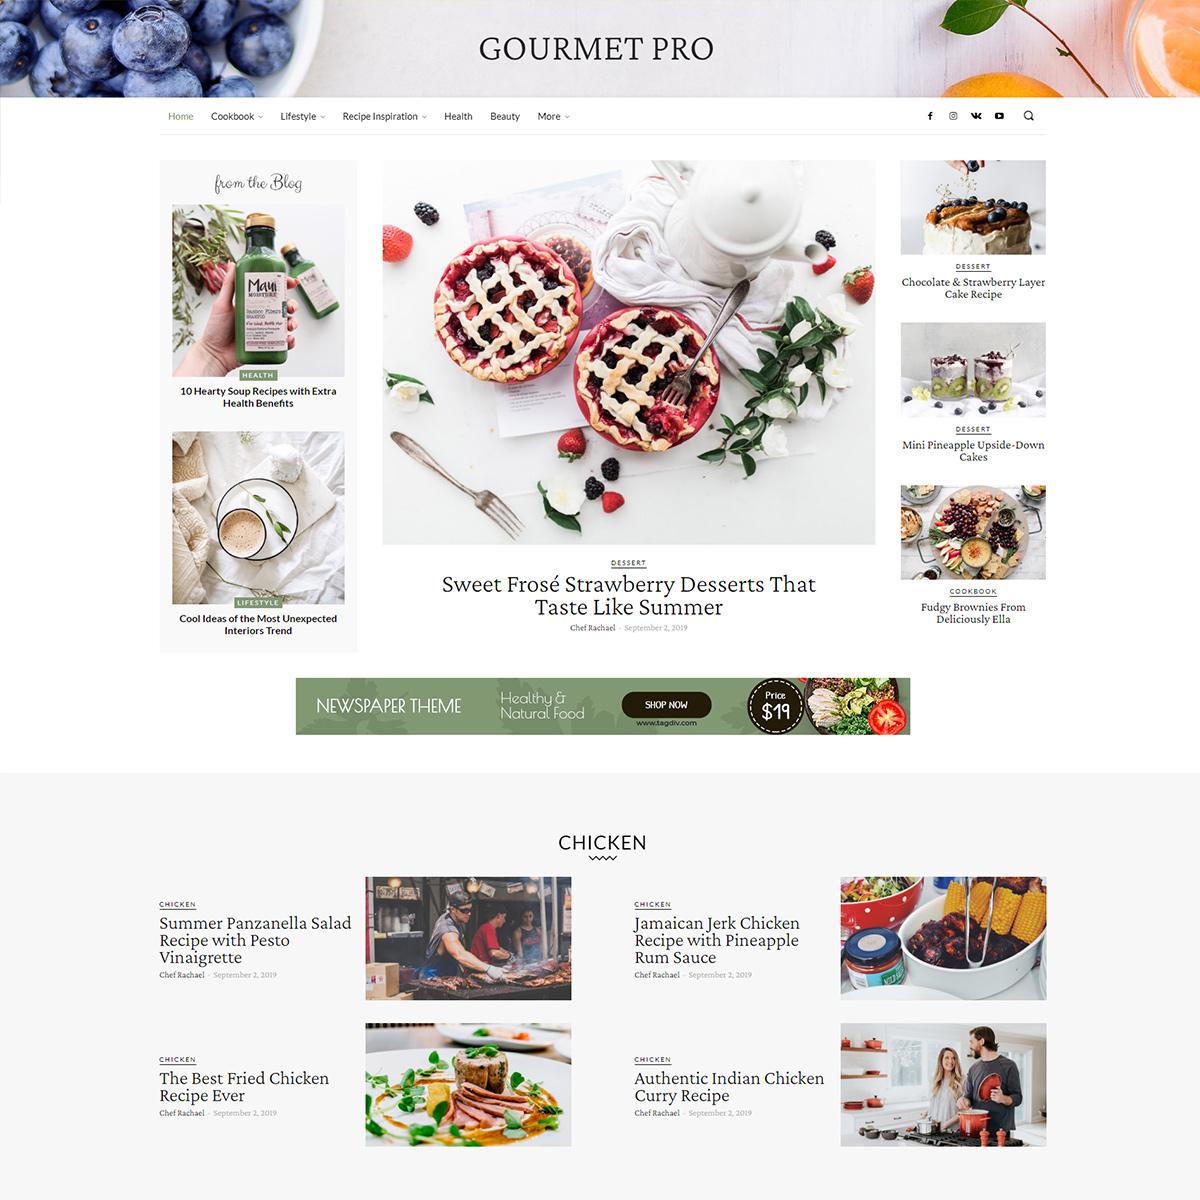 Gourmet Pro tagDiv Newspaper Theme Demo